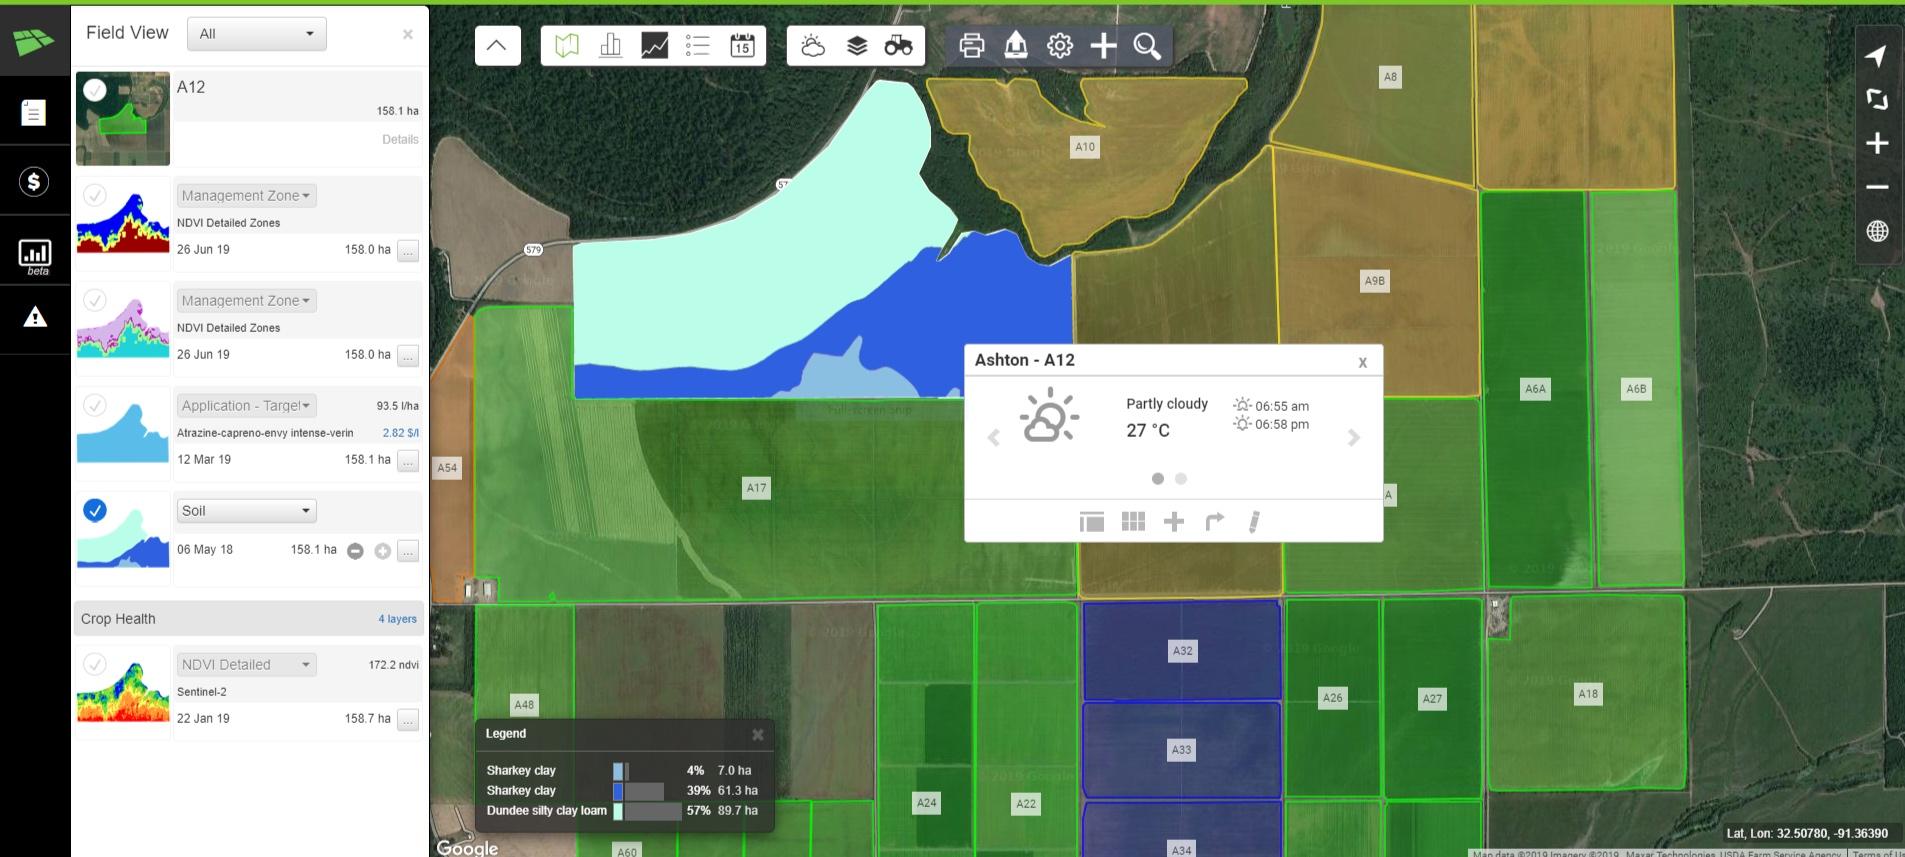 Crux+Da+Website+Agronomic+Insights+Soil+Map+%282%29.jpg